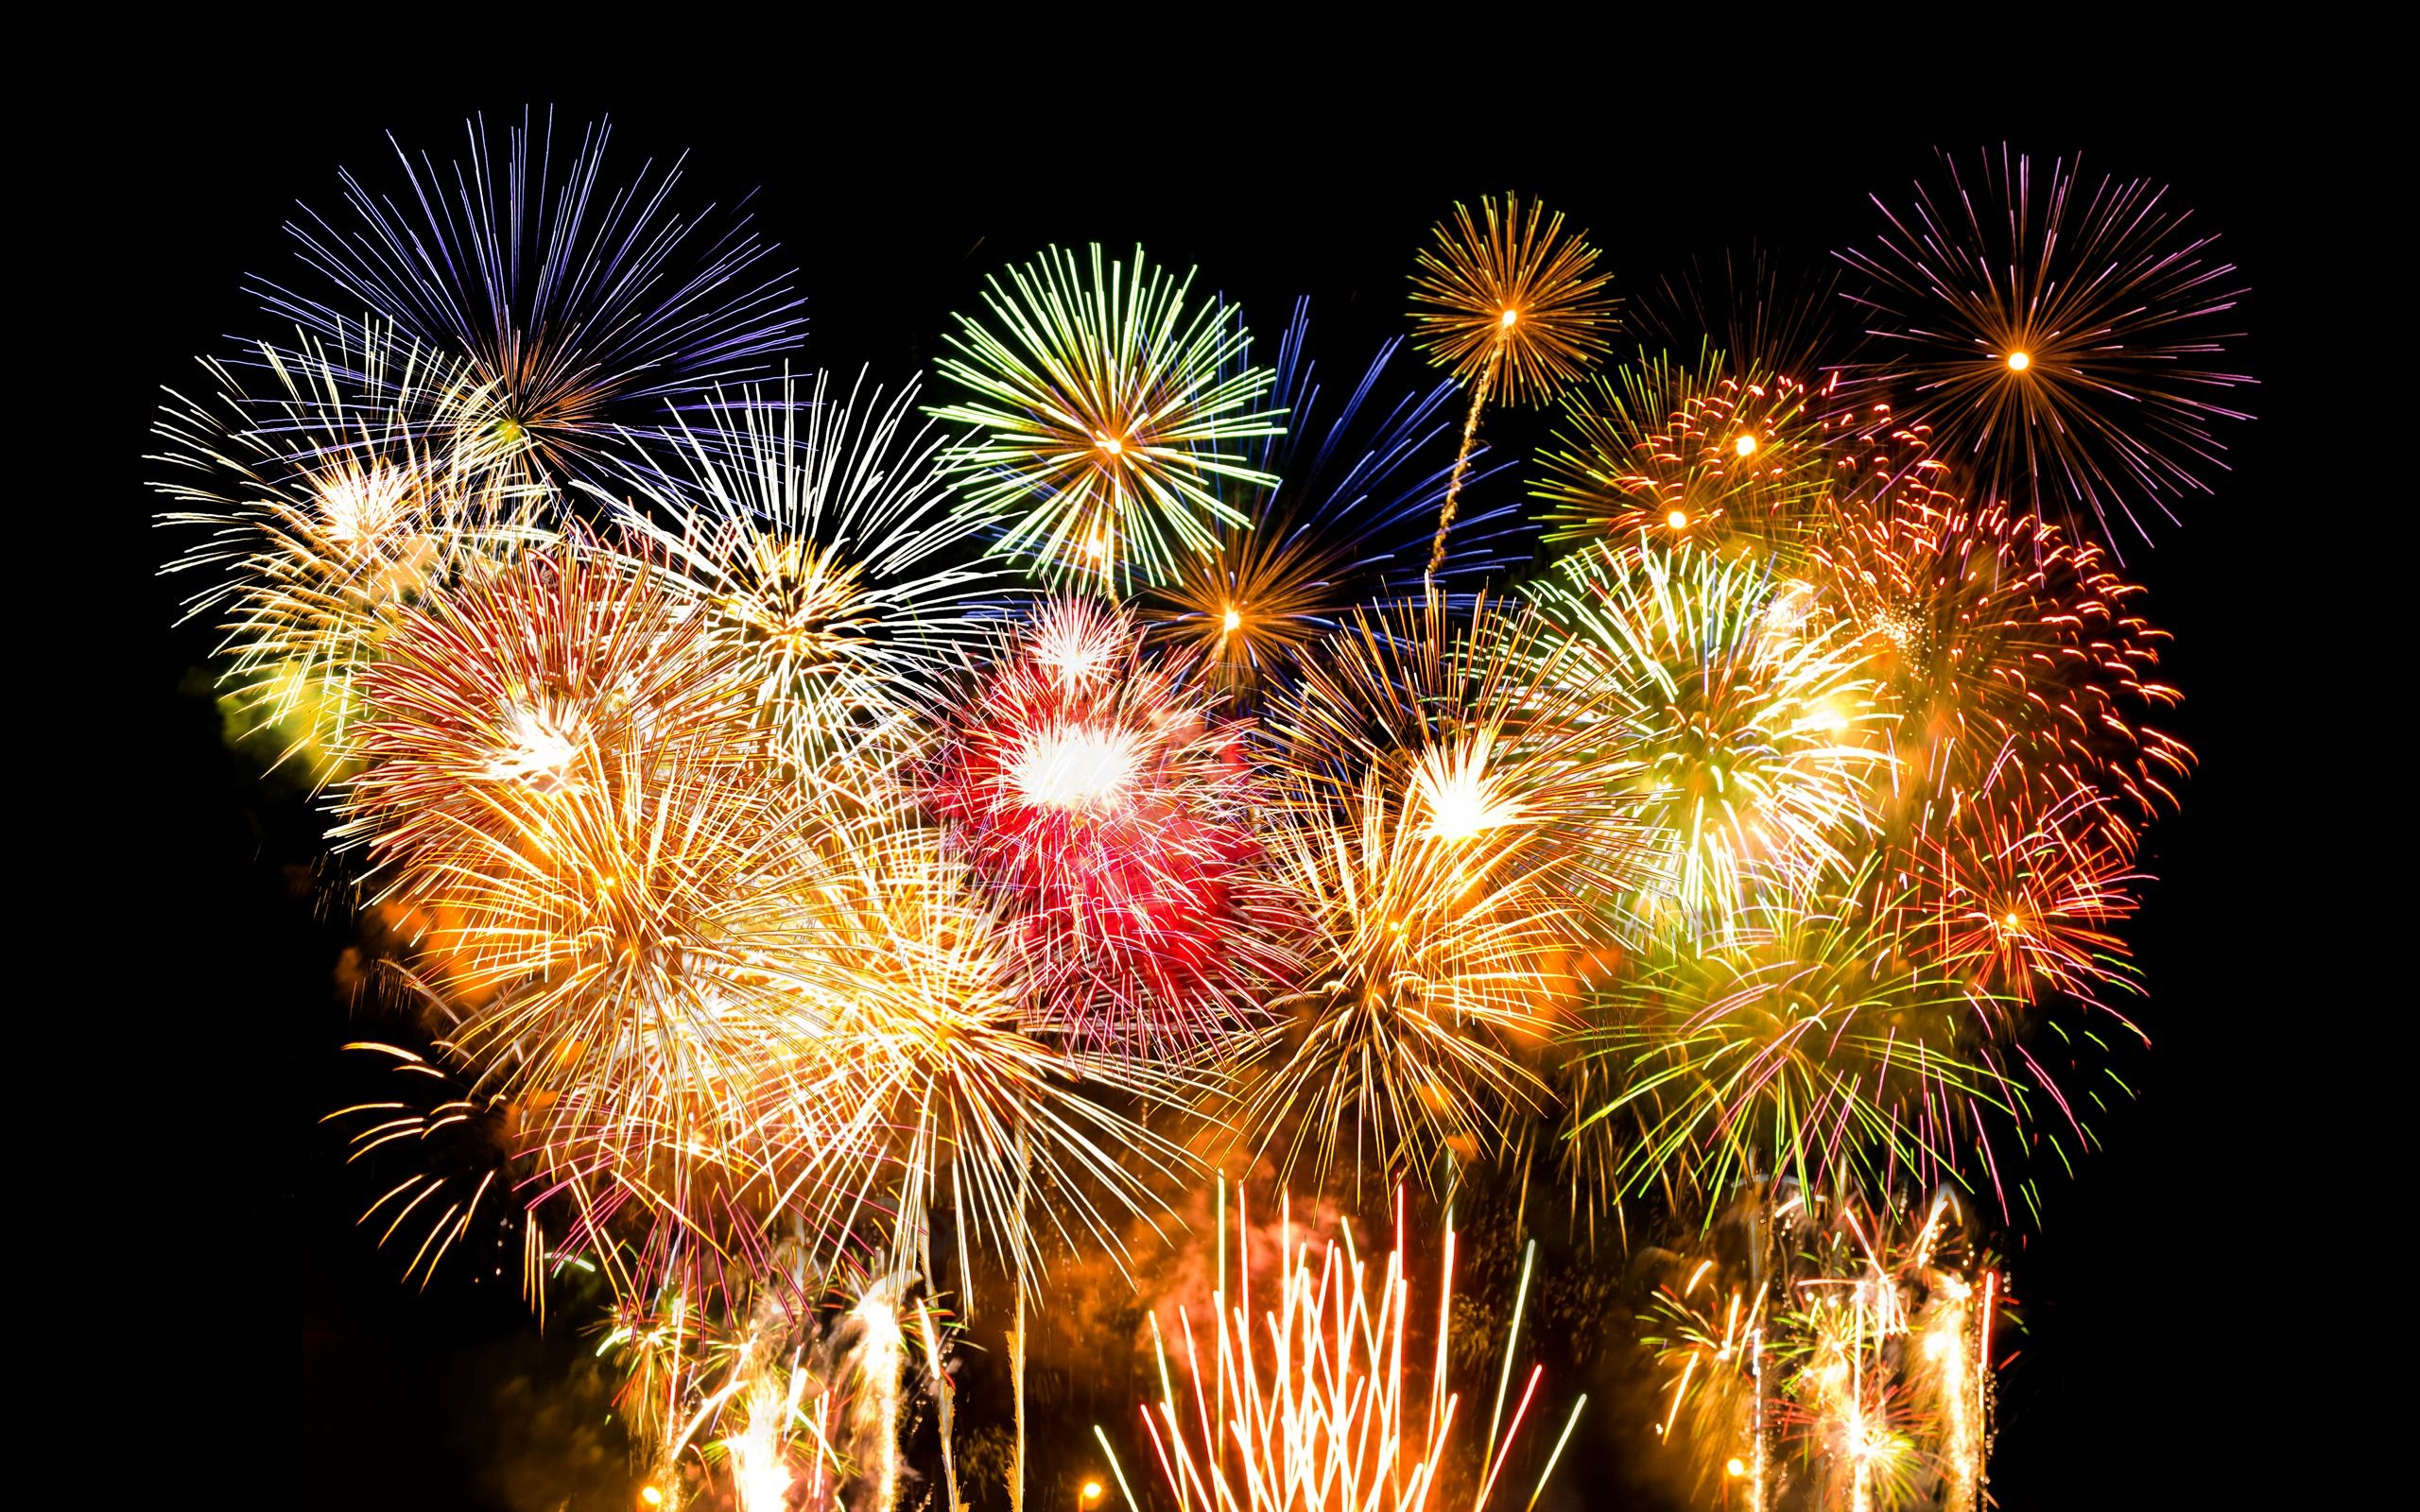 Firework Wallpaper Desktop Background New years eve